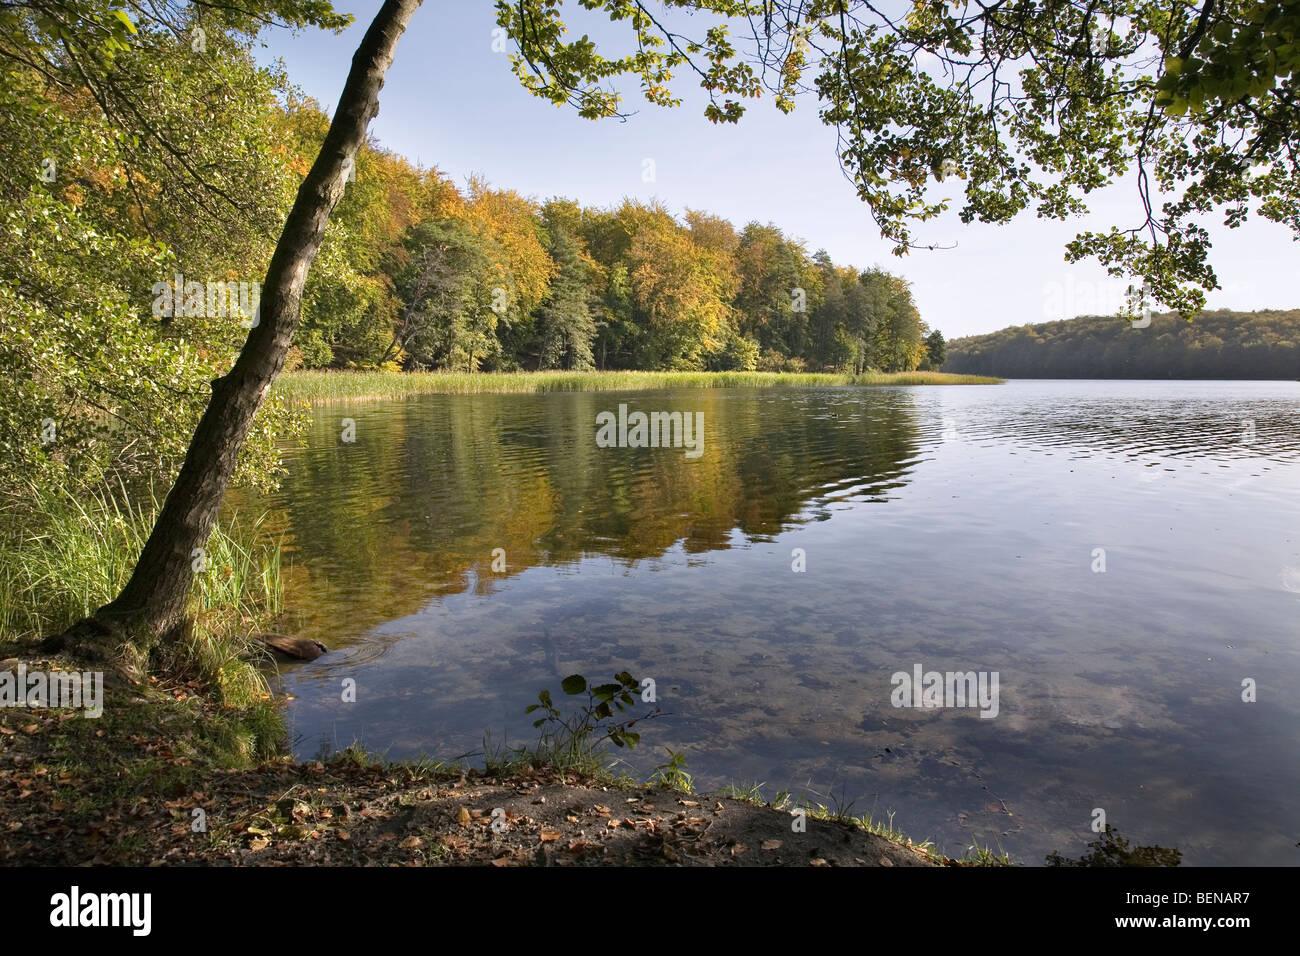 Liepnitzsee, Wandlitz, Barnim, Brandenburg, Germany - Stock Image